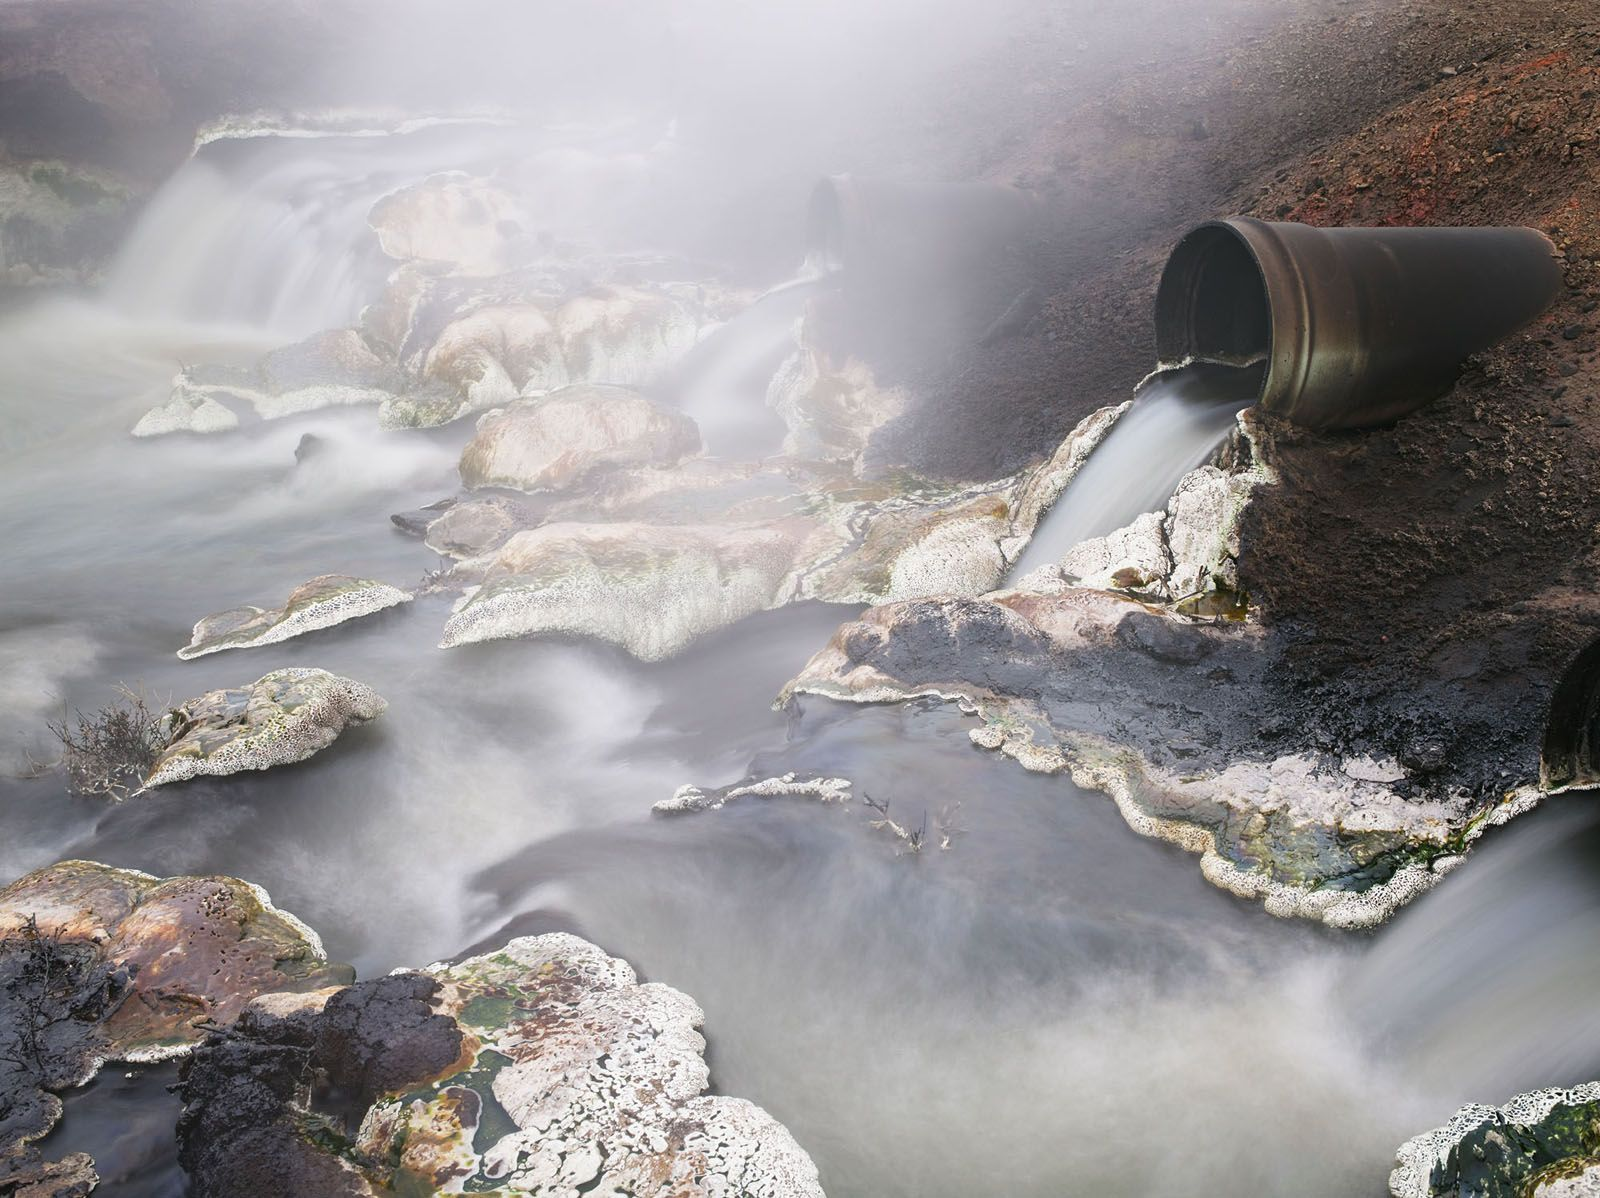 LUCAS FOGLIA, Produced Water, Hamilton Dome Oil Field, Owl Creek, Wyoming, 2013